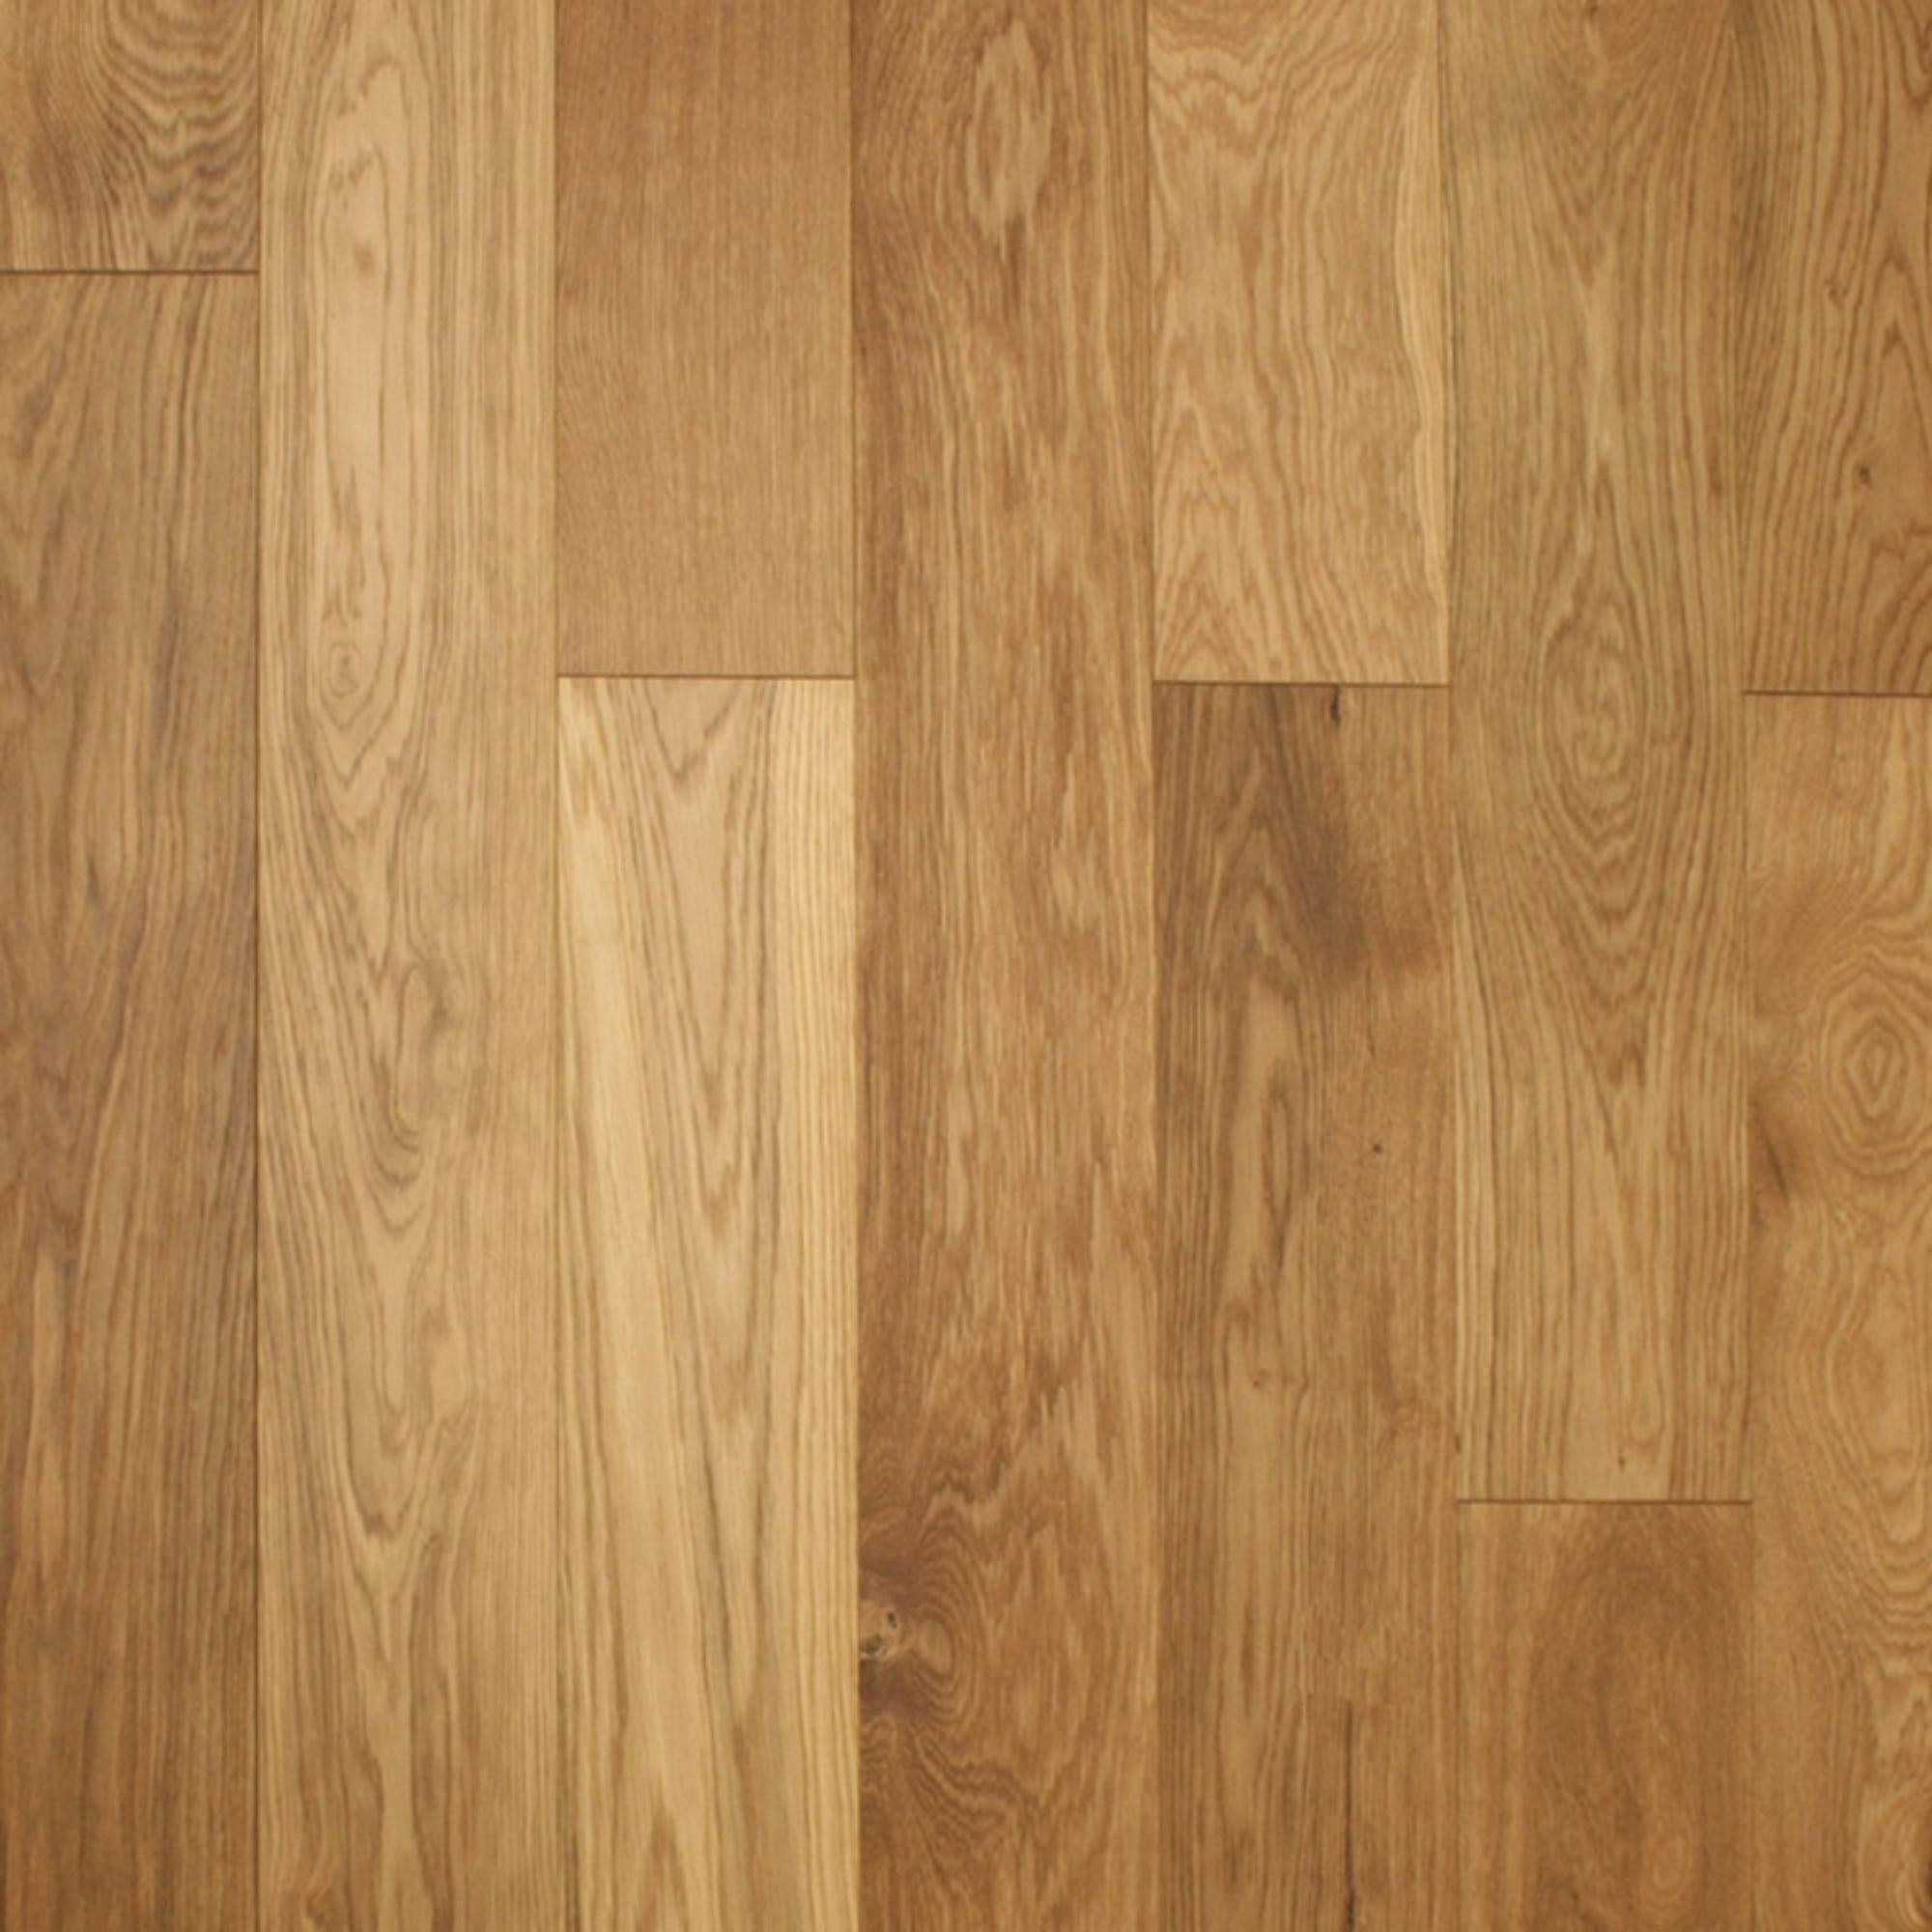 Wood flooring multi layer 18x150mm brushed matt for Engineered oak flooring